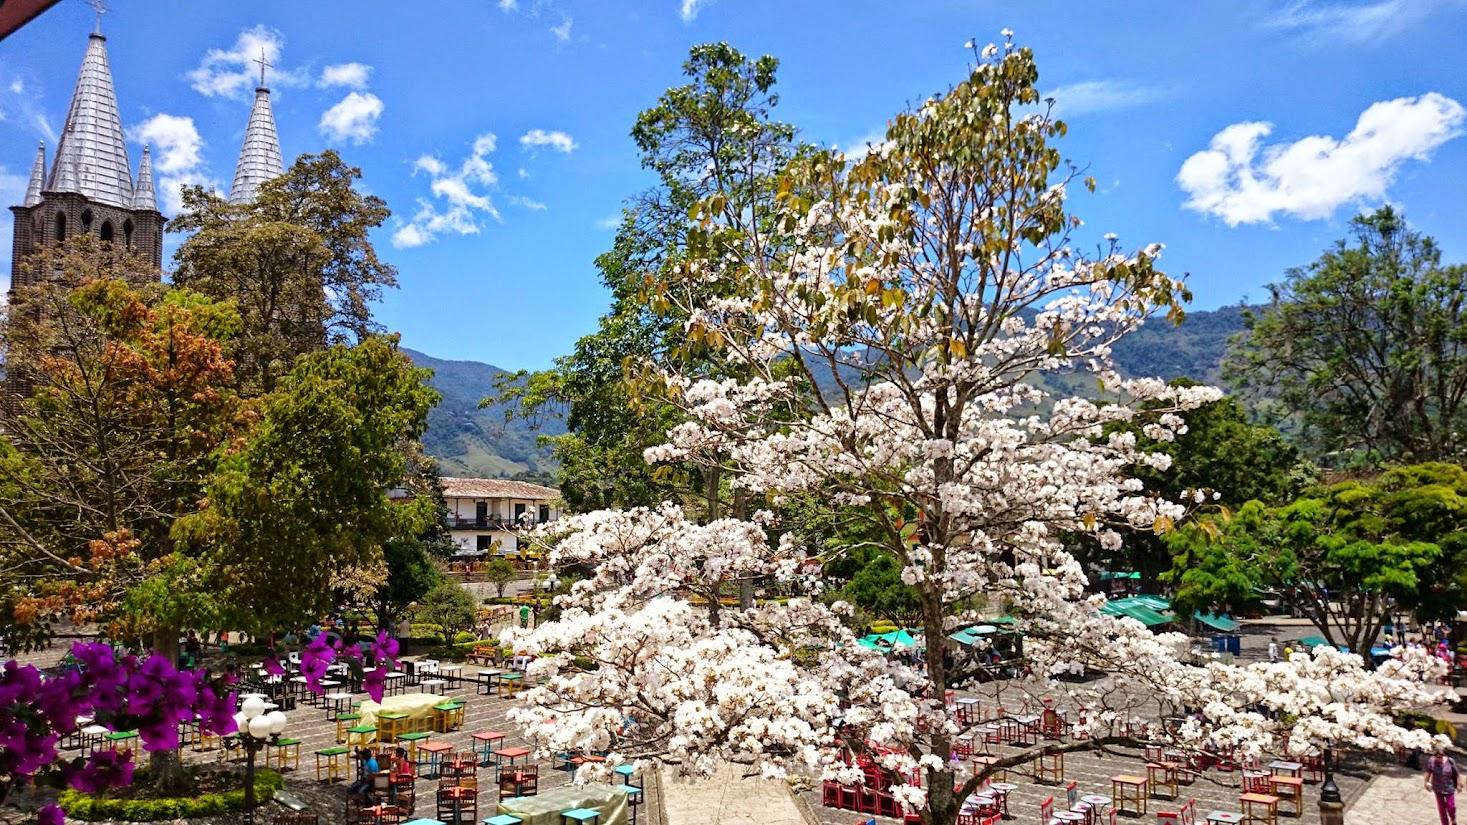 El guayacan blanco jardin antioquia for Antioquia jardin